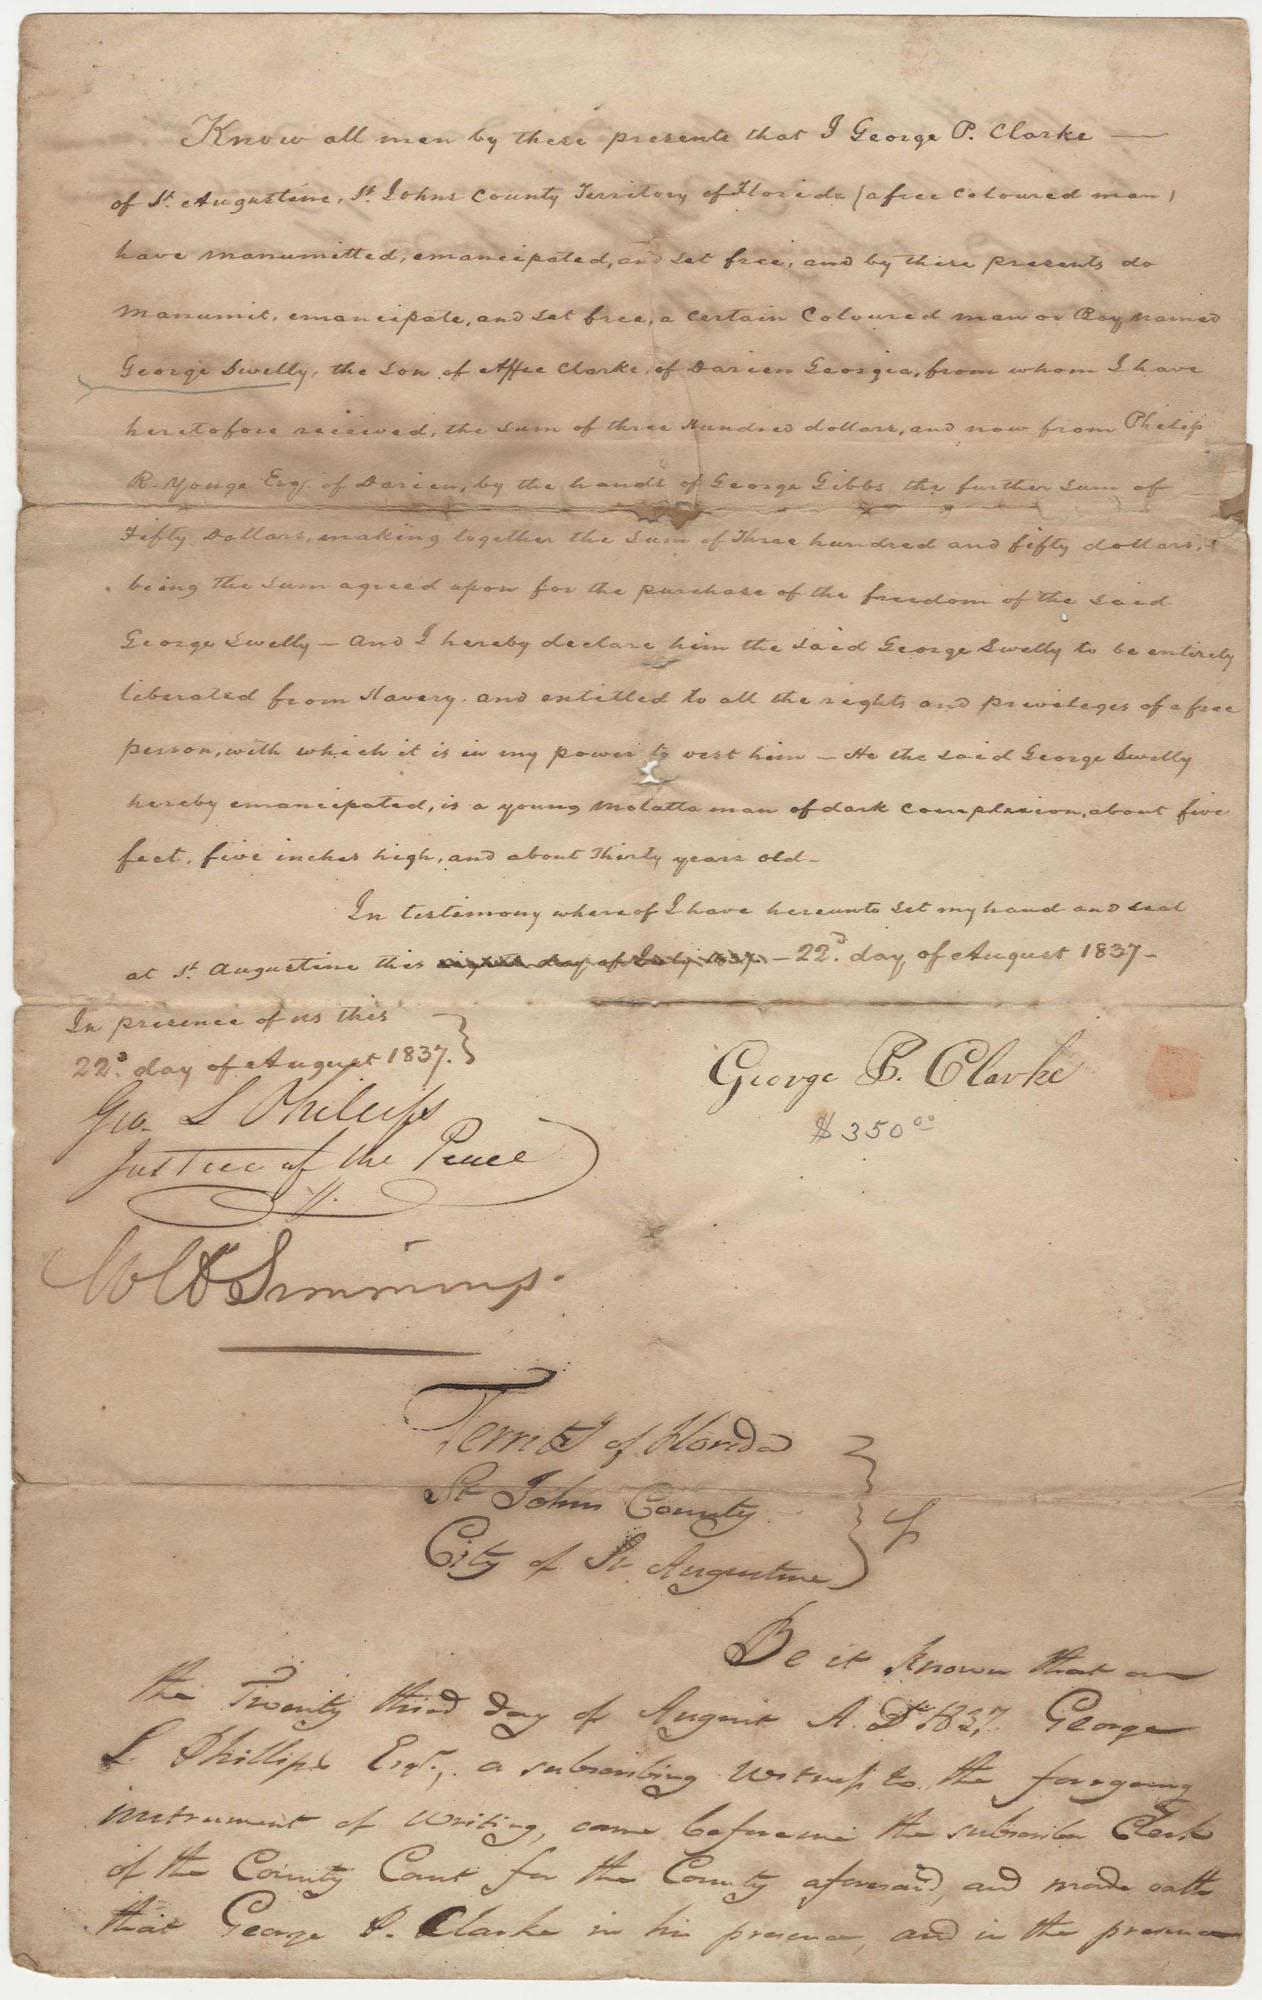 626.  Deed of Emancipation -- August 22, 1837